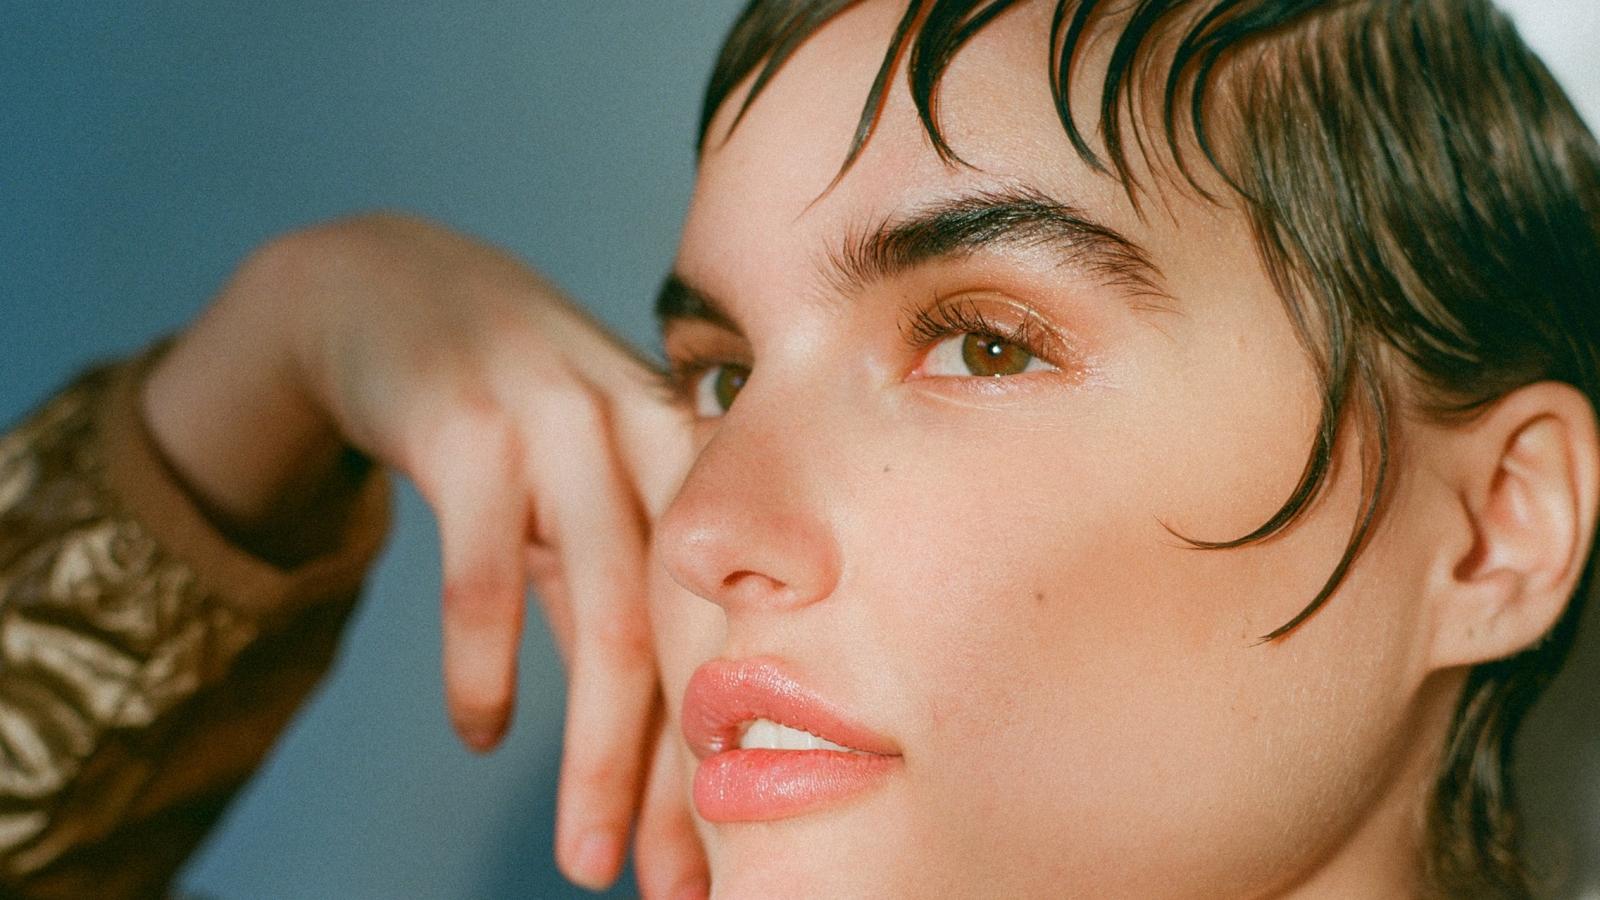 Tef Gorrin x Heather Hazzan - 110